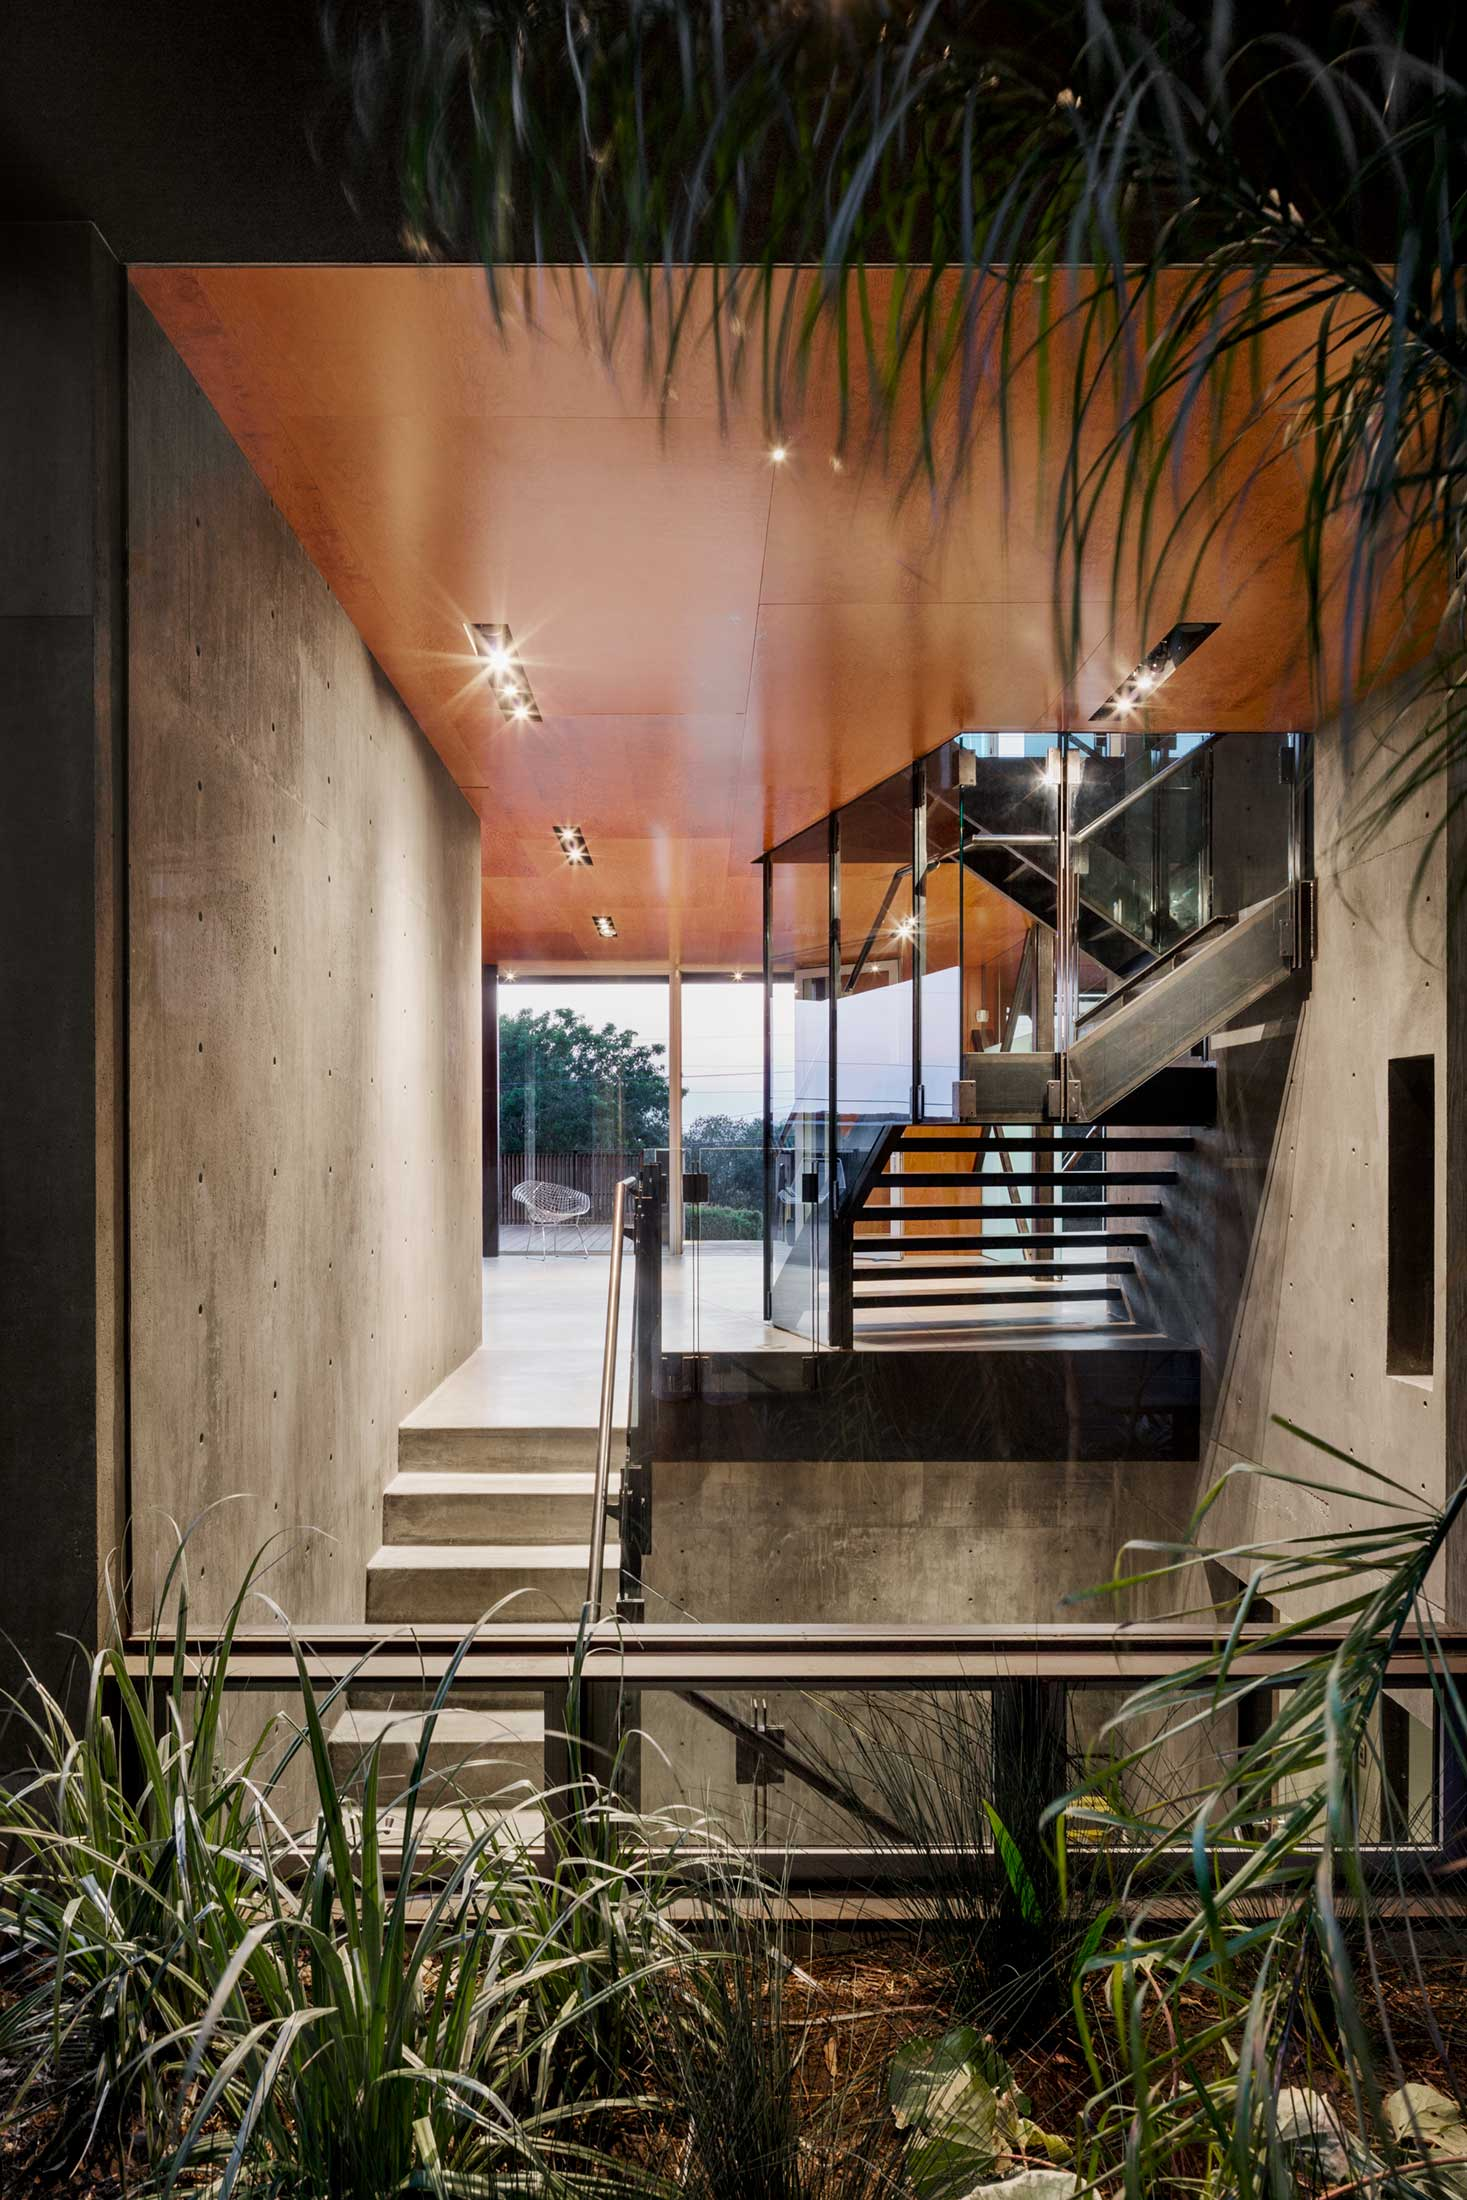 modern-architecture-residential-stairwell-california-shubindonaldson-skyline-1